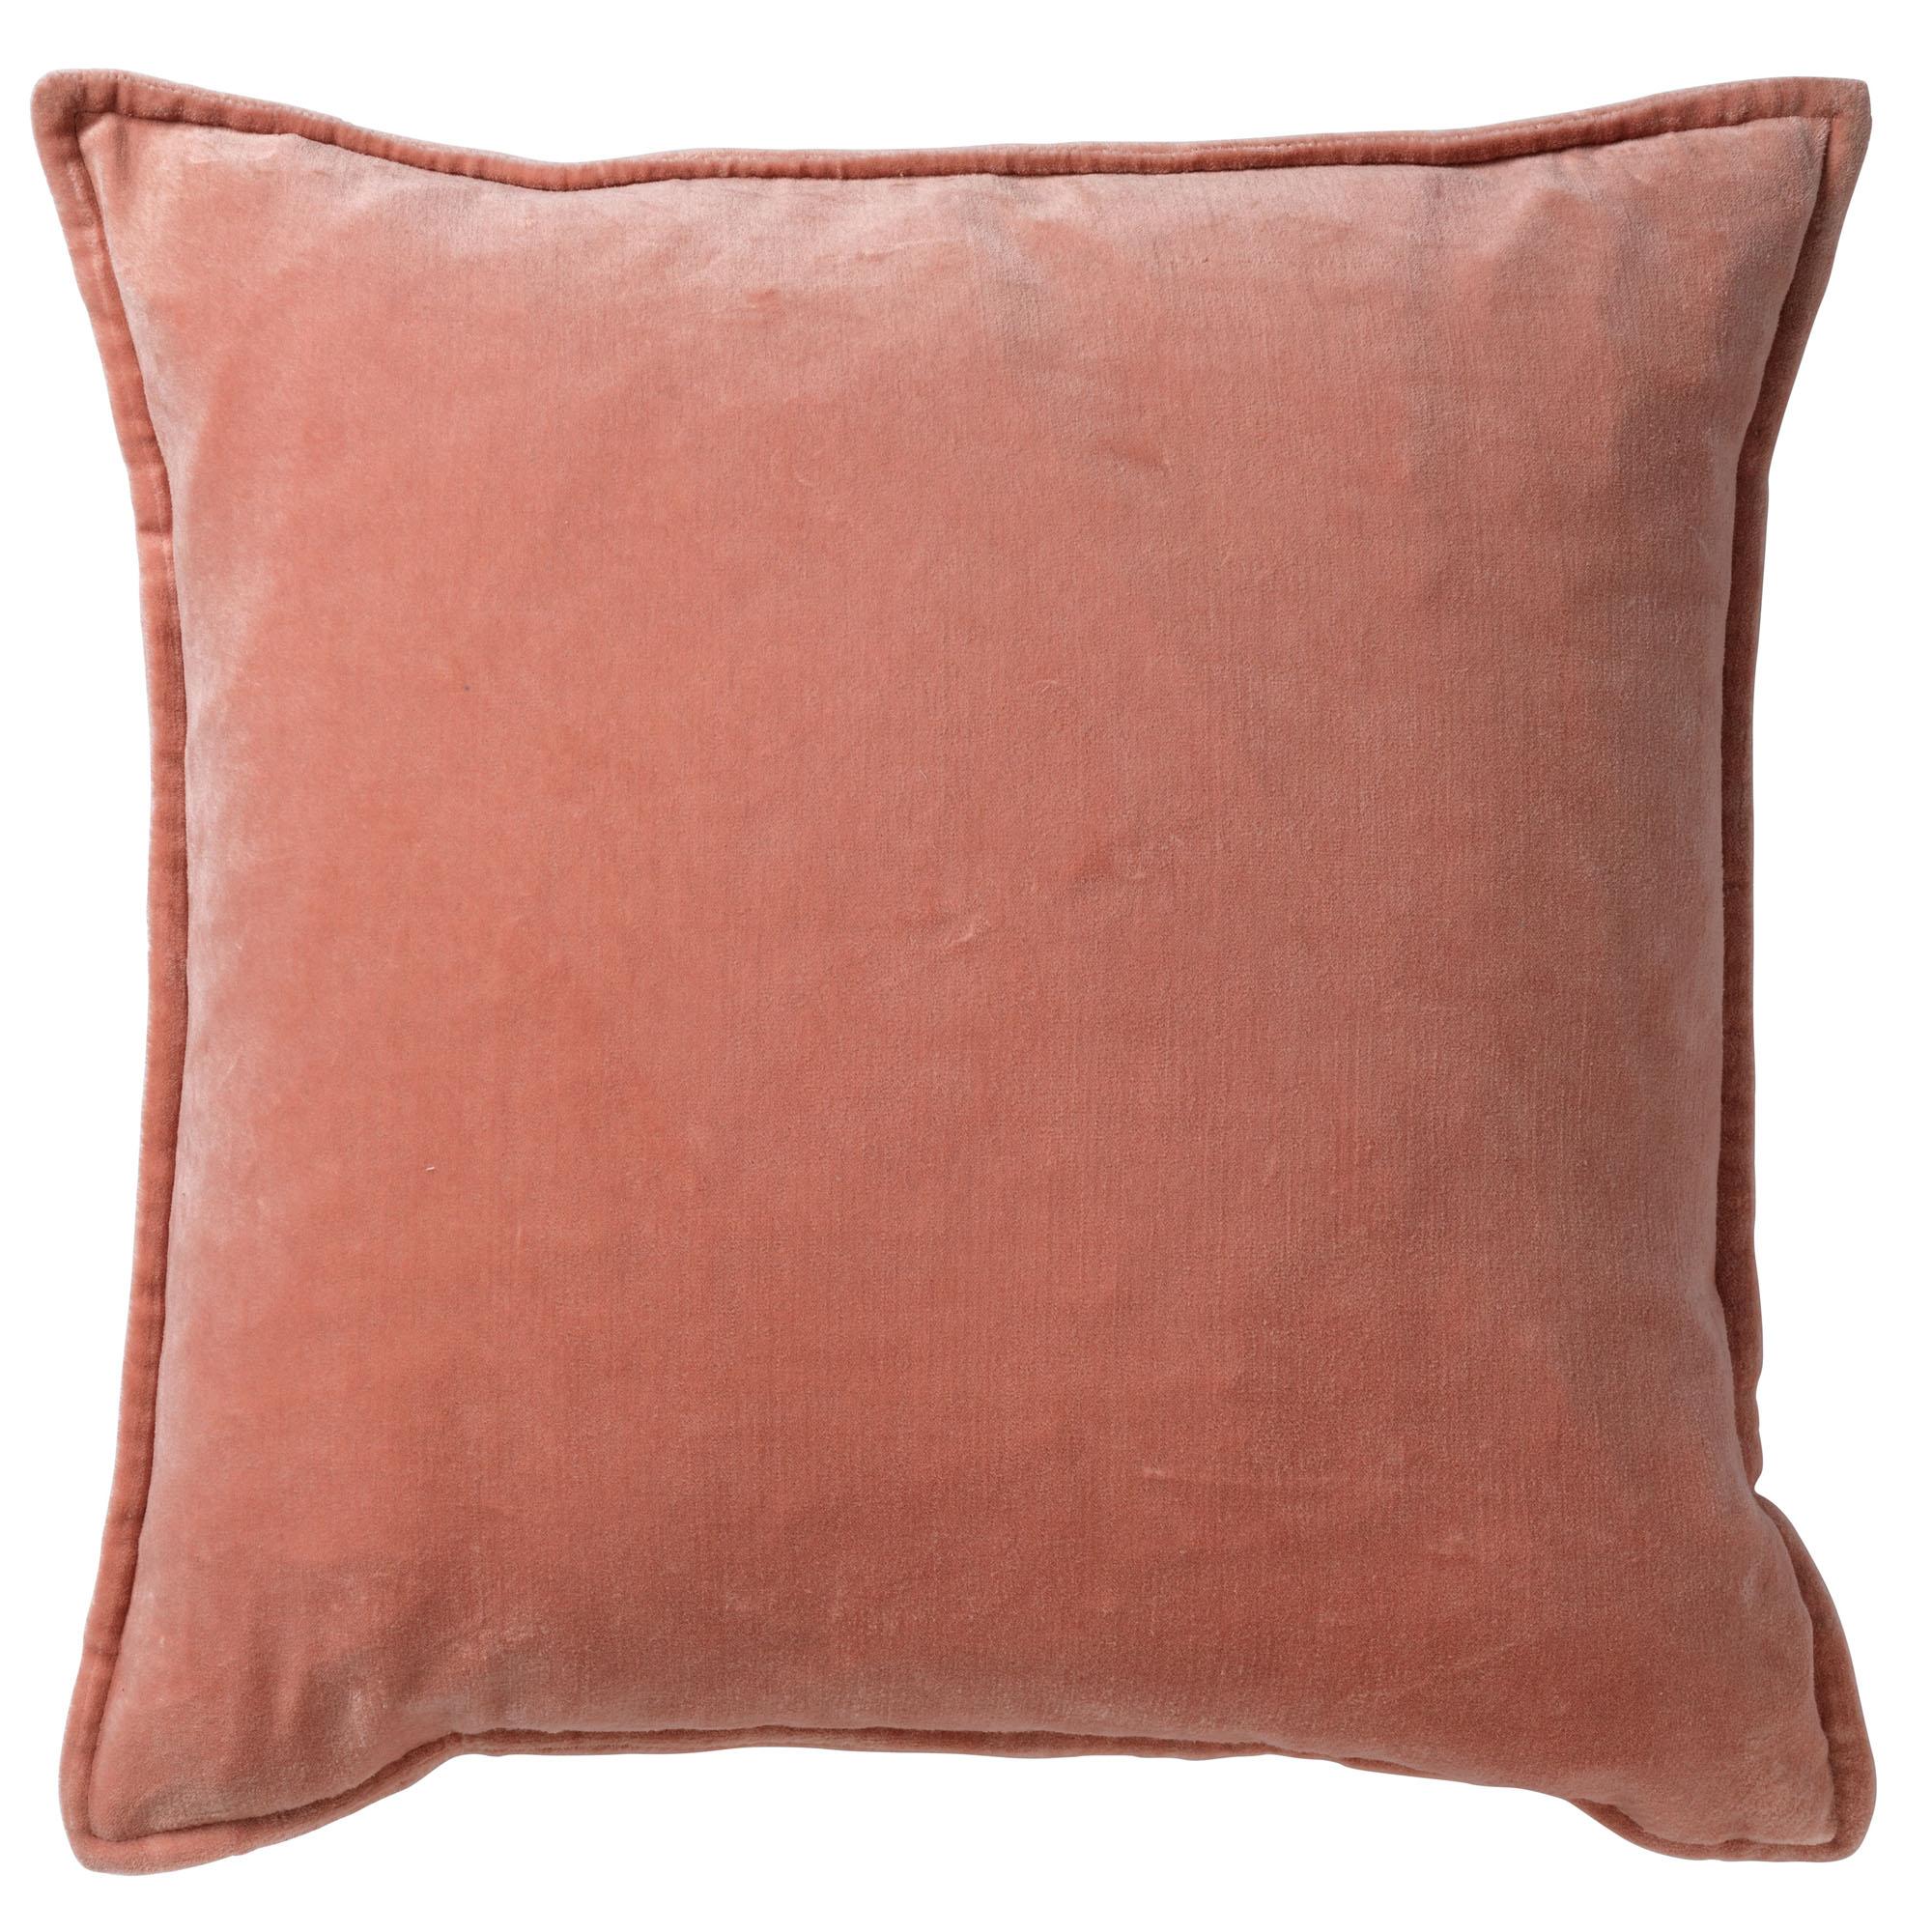 CAITH - Kussenhoes velvet Muted Clay 50x50 cm